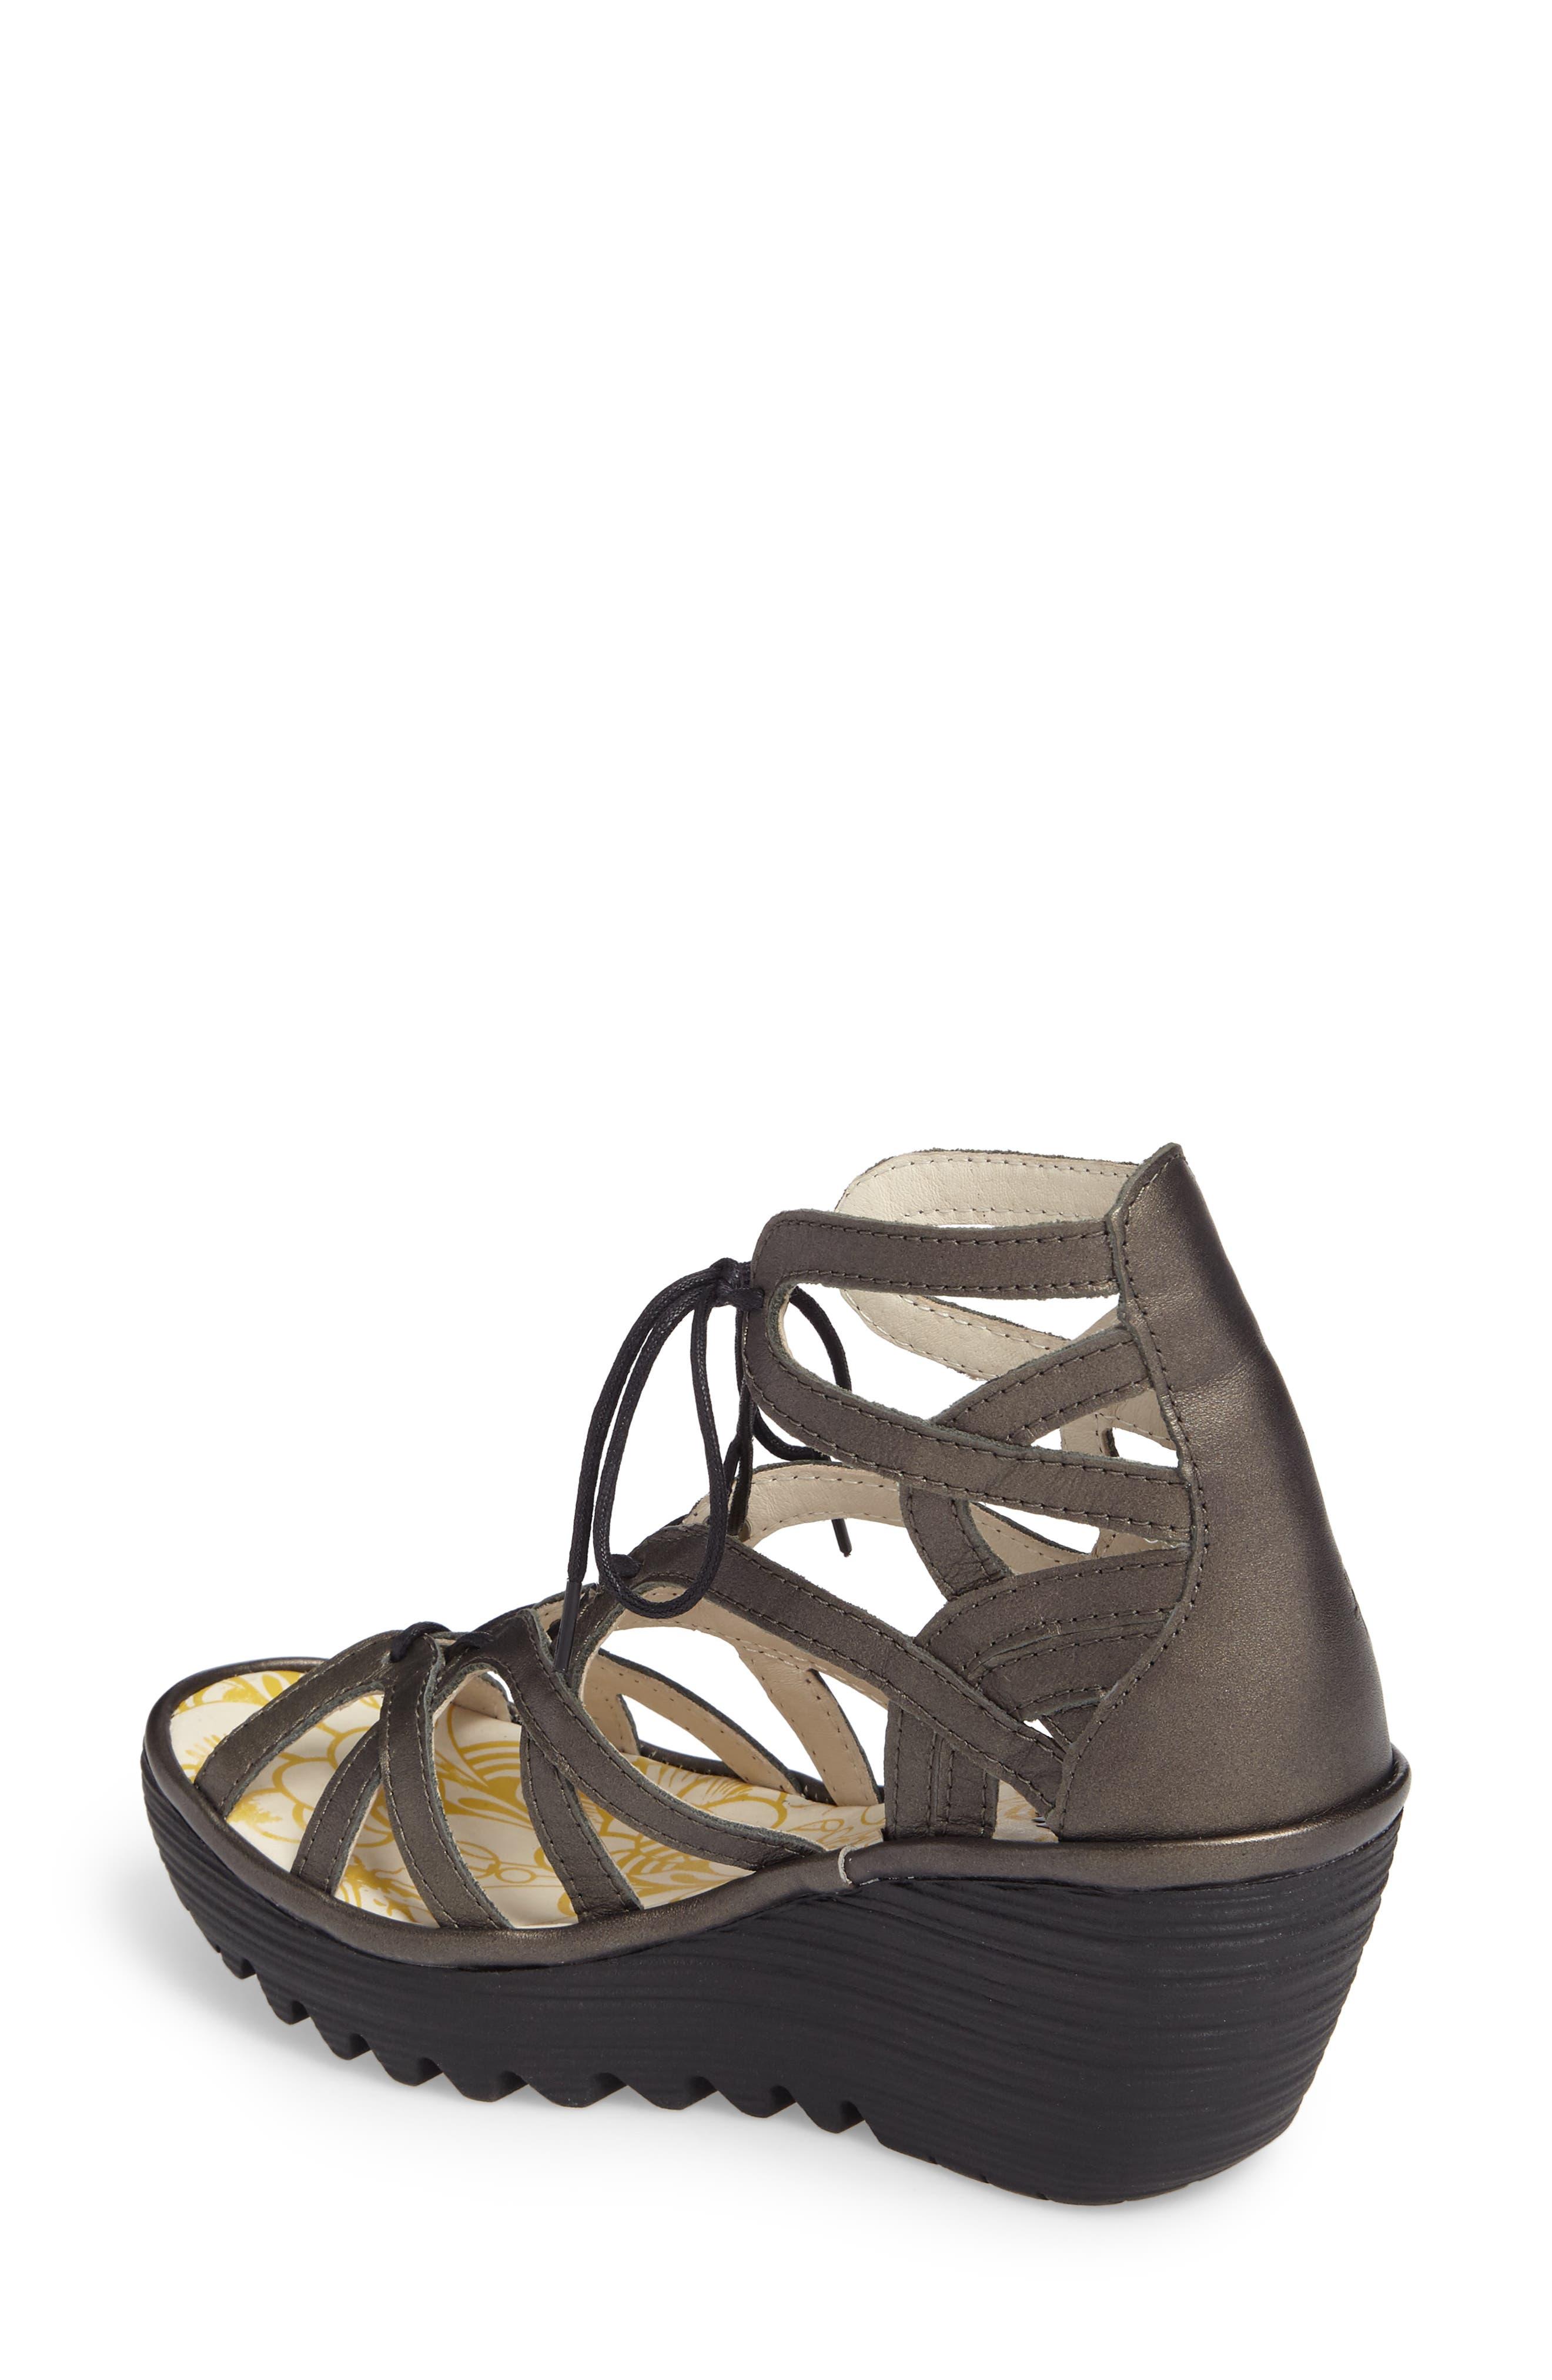 'Yuke' Platform Wedge Sandal,                             Alternate thumbnail 2, color,                             ANTHRACITE LEATHER